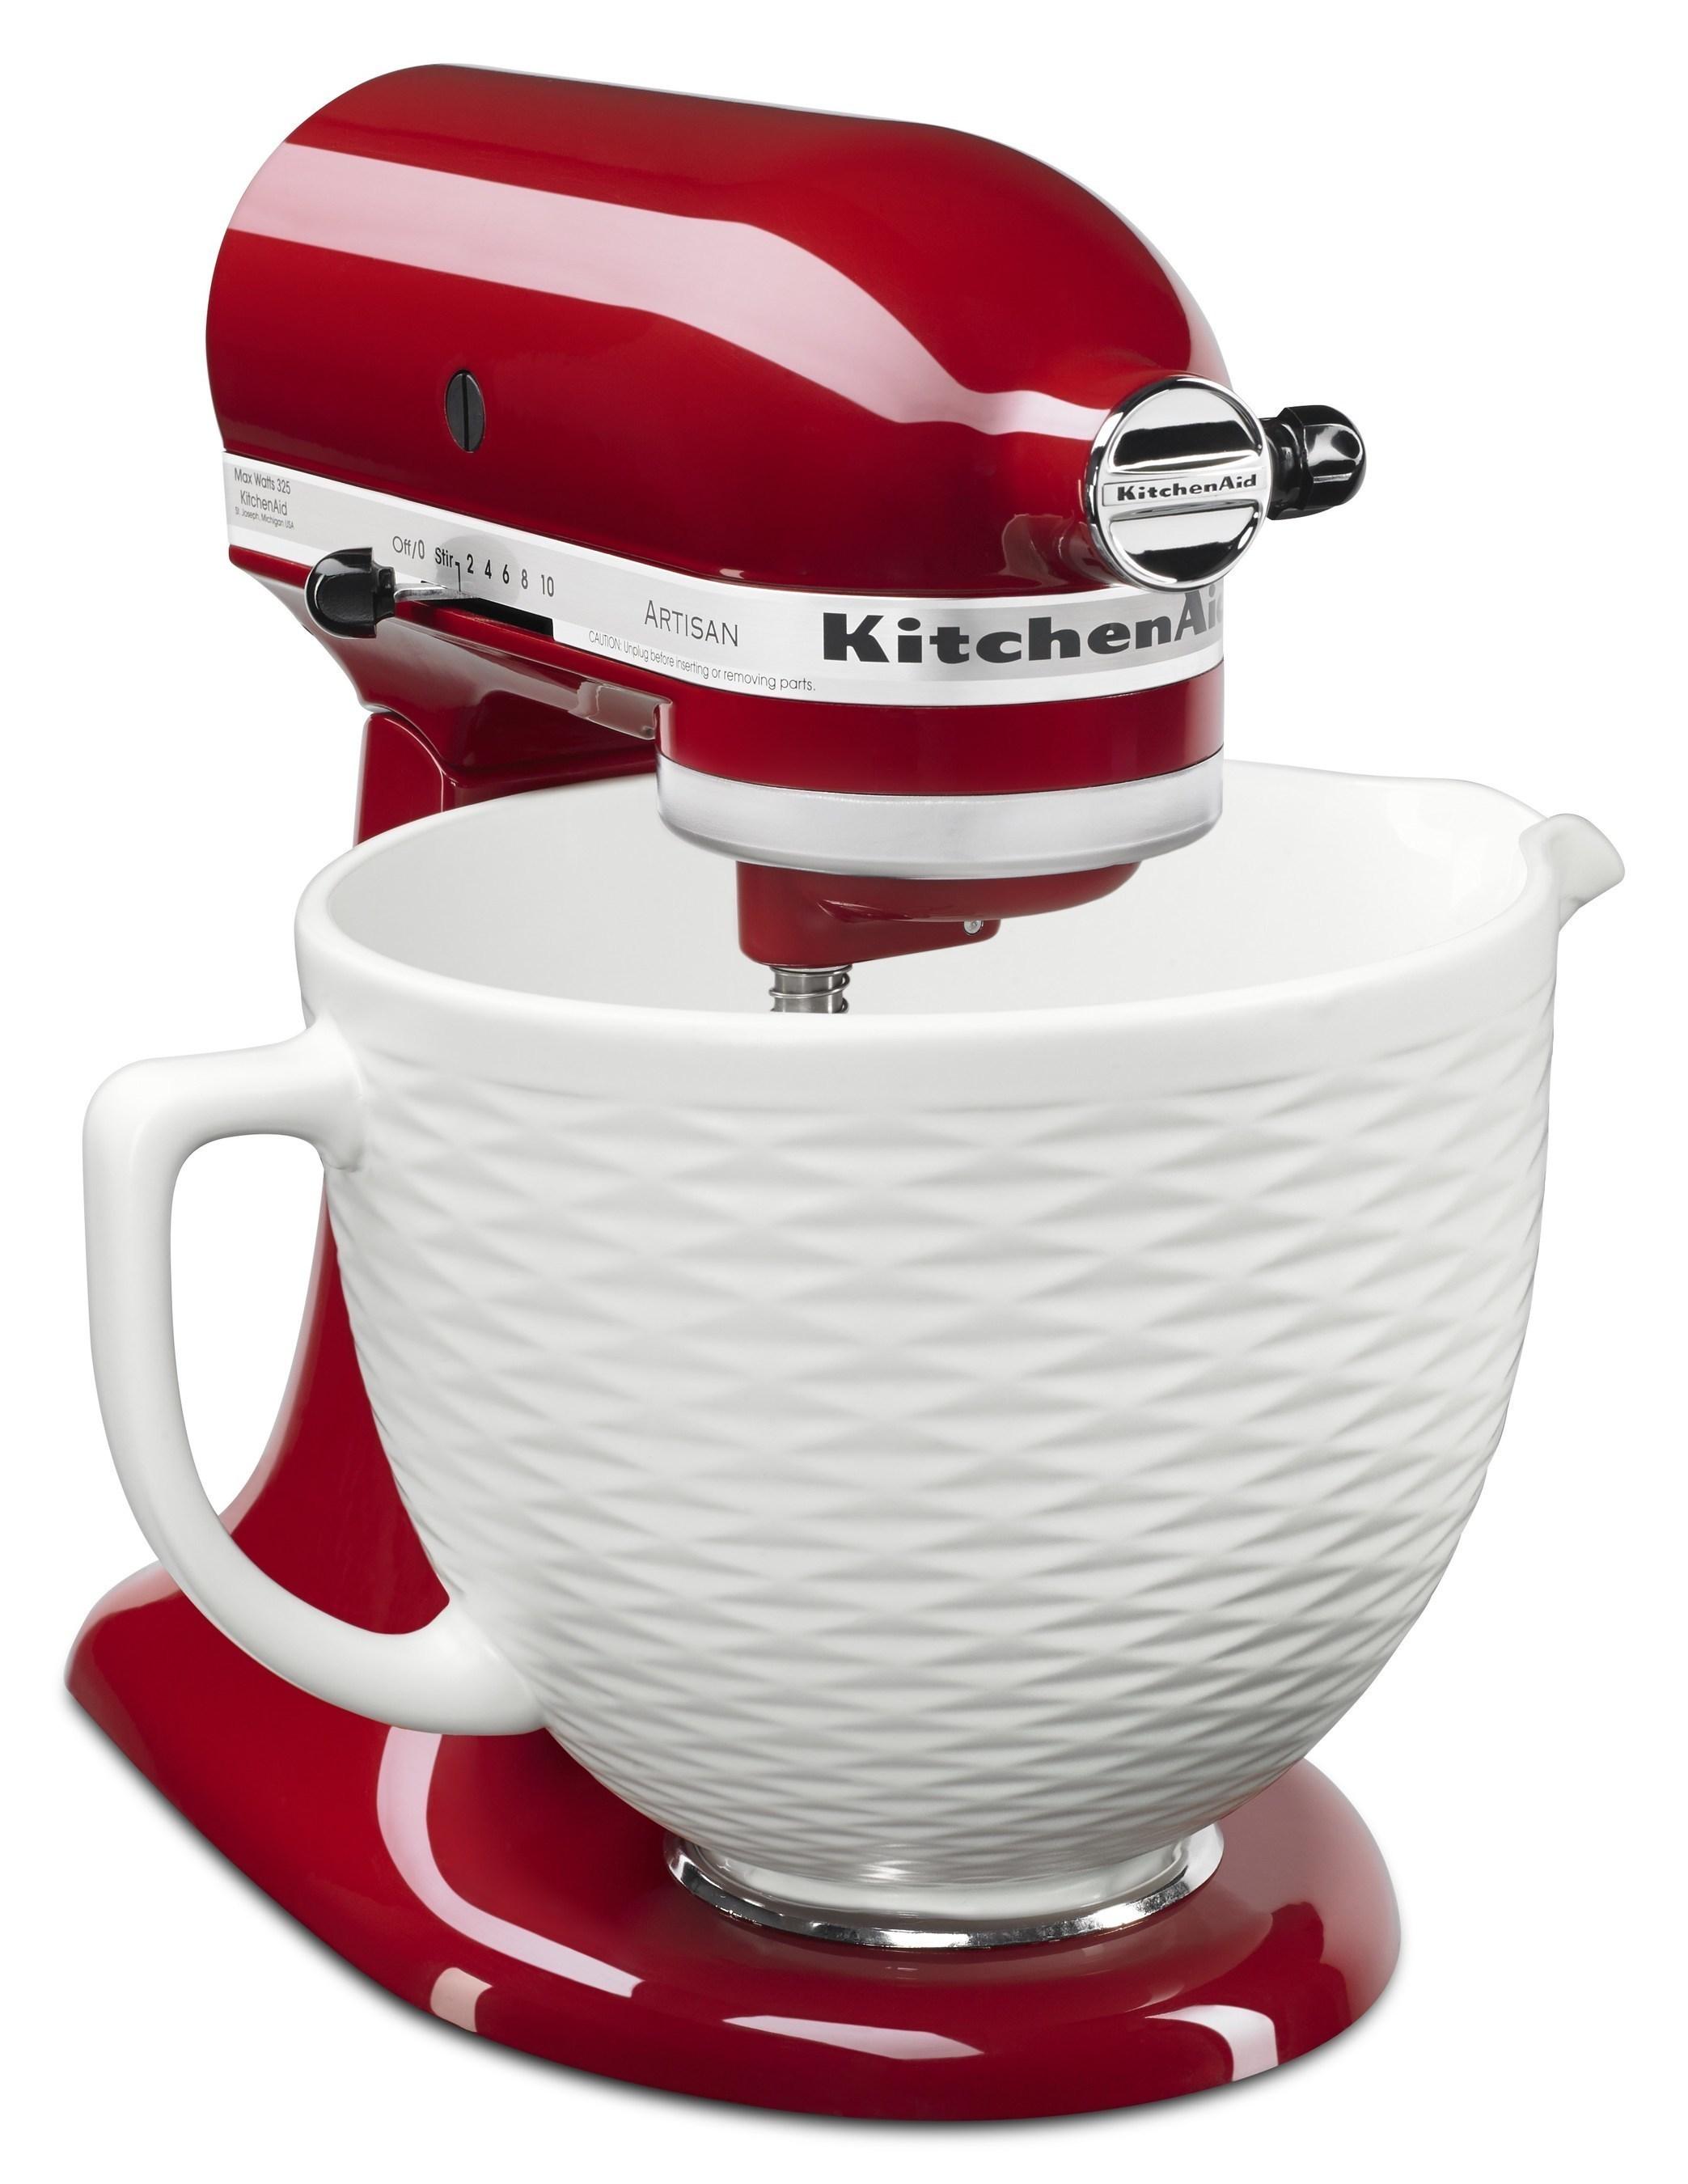 The New Kitchenaid R Ceramic Bowl Fits 4 5 Quart And